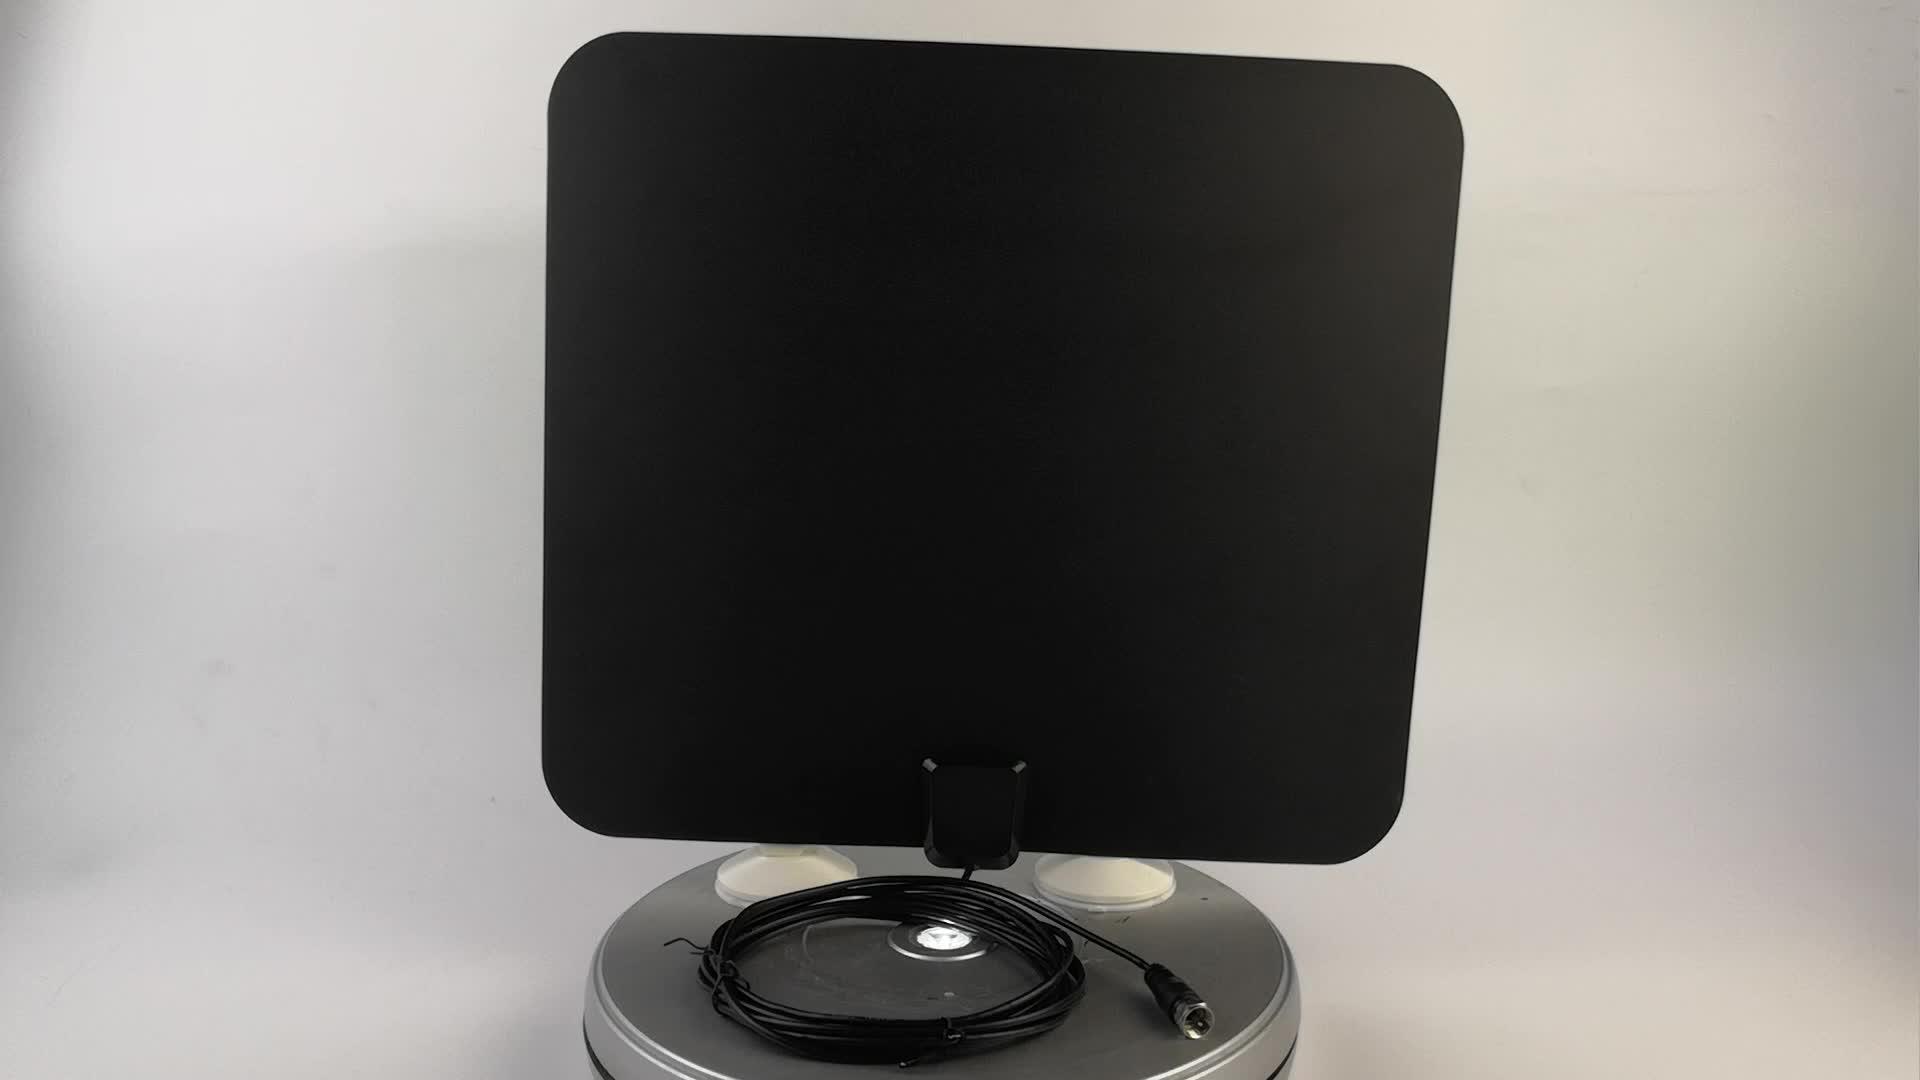 Vendita calda digital tv antenna VHF UHF Antenna TV interna